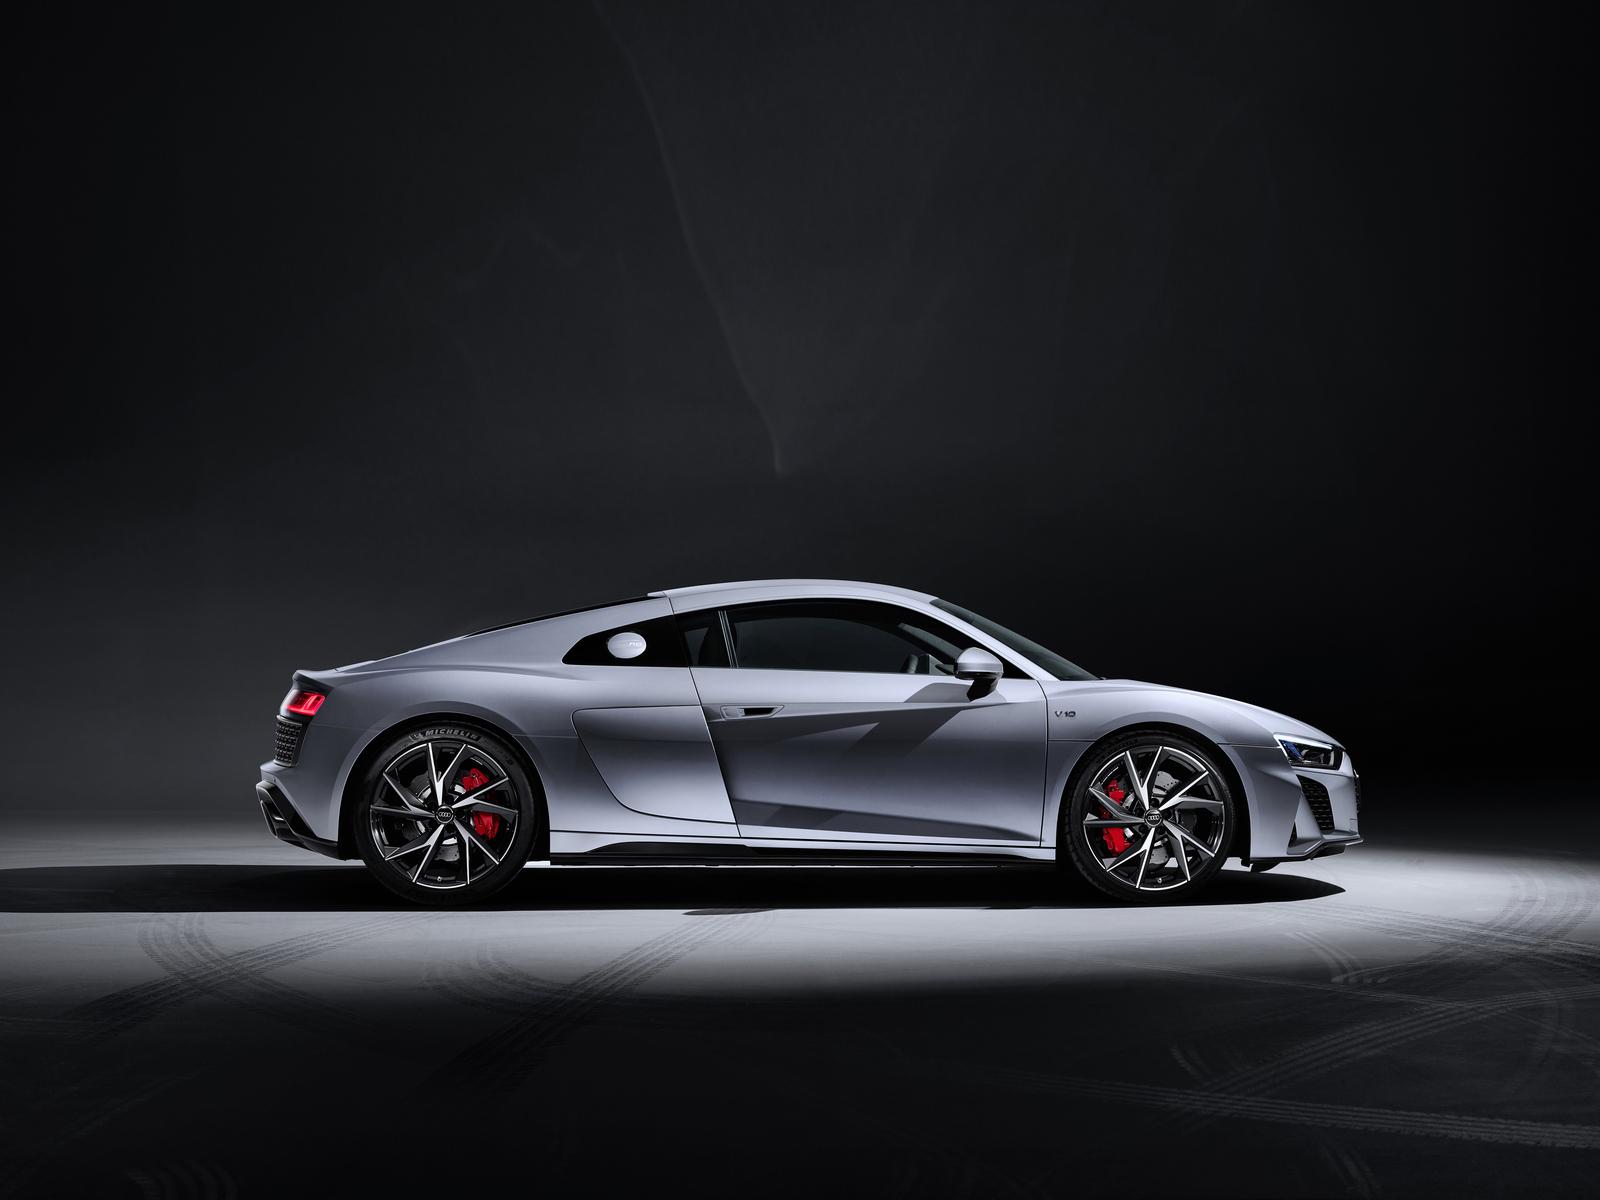 5k-audi-r8-v10-rwd-coupe-2019-87.jpg